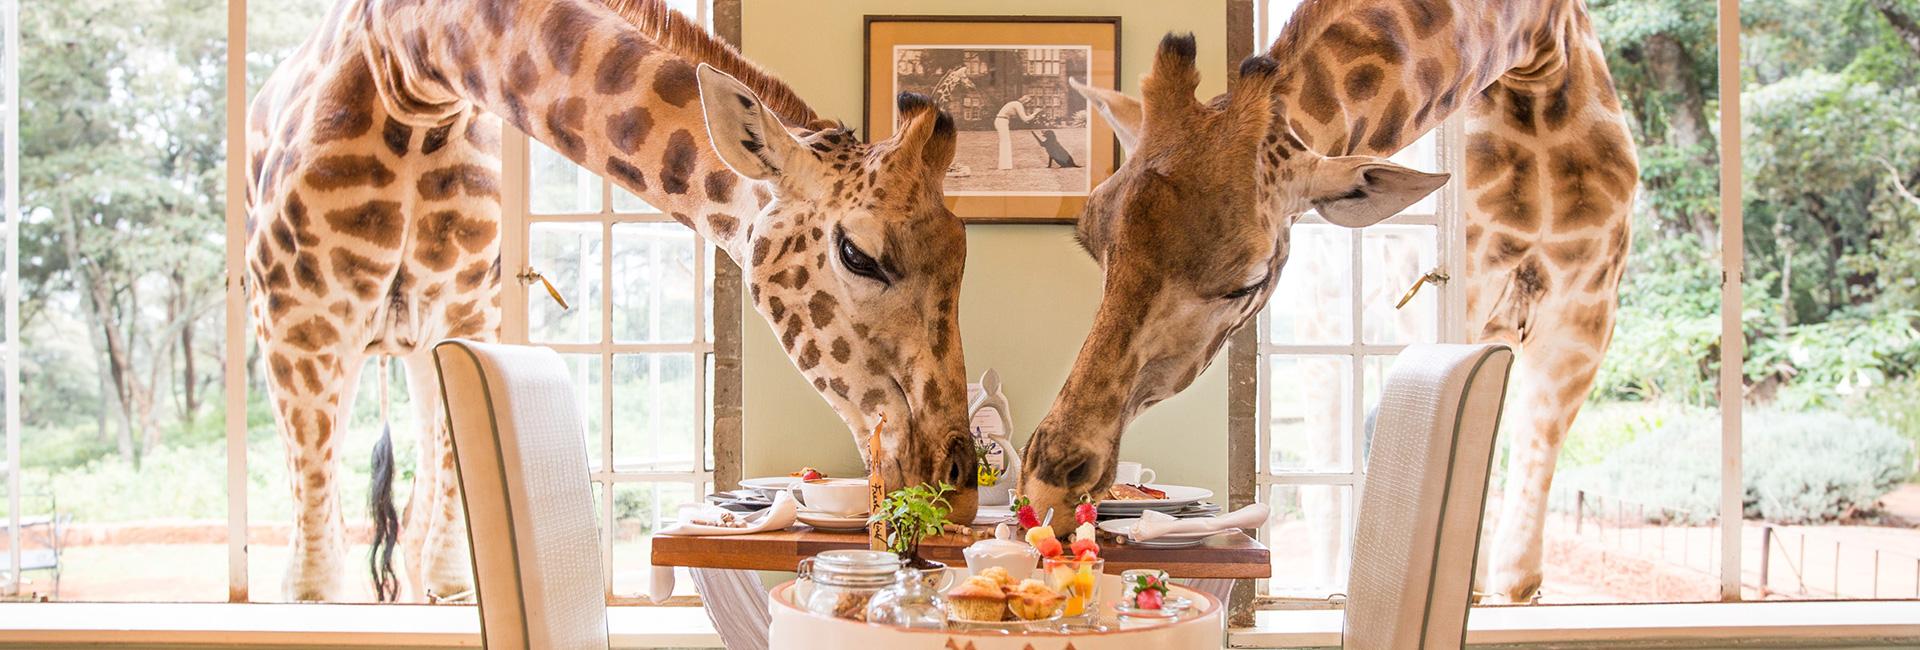 Giraffe Manor Breakfast 2